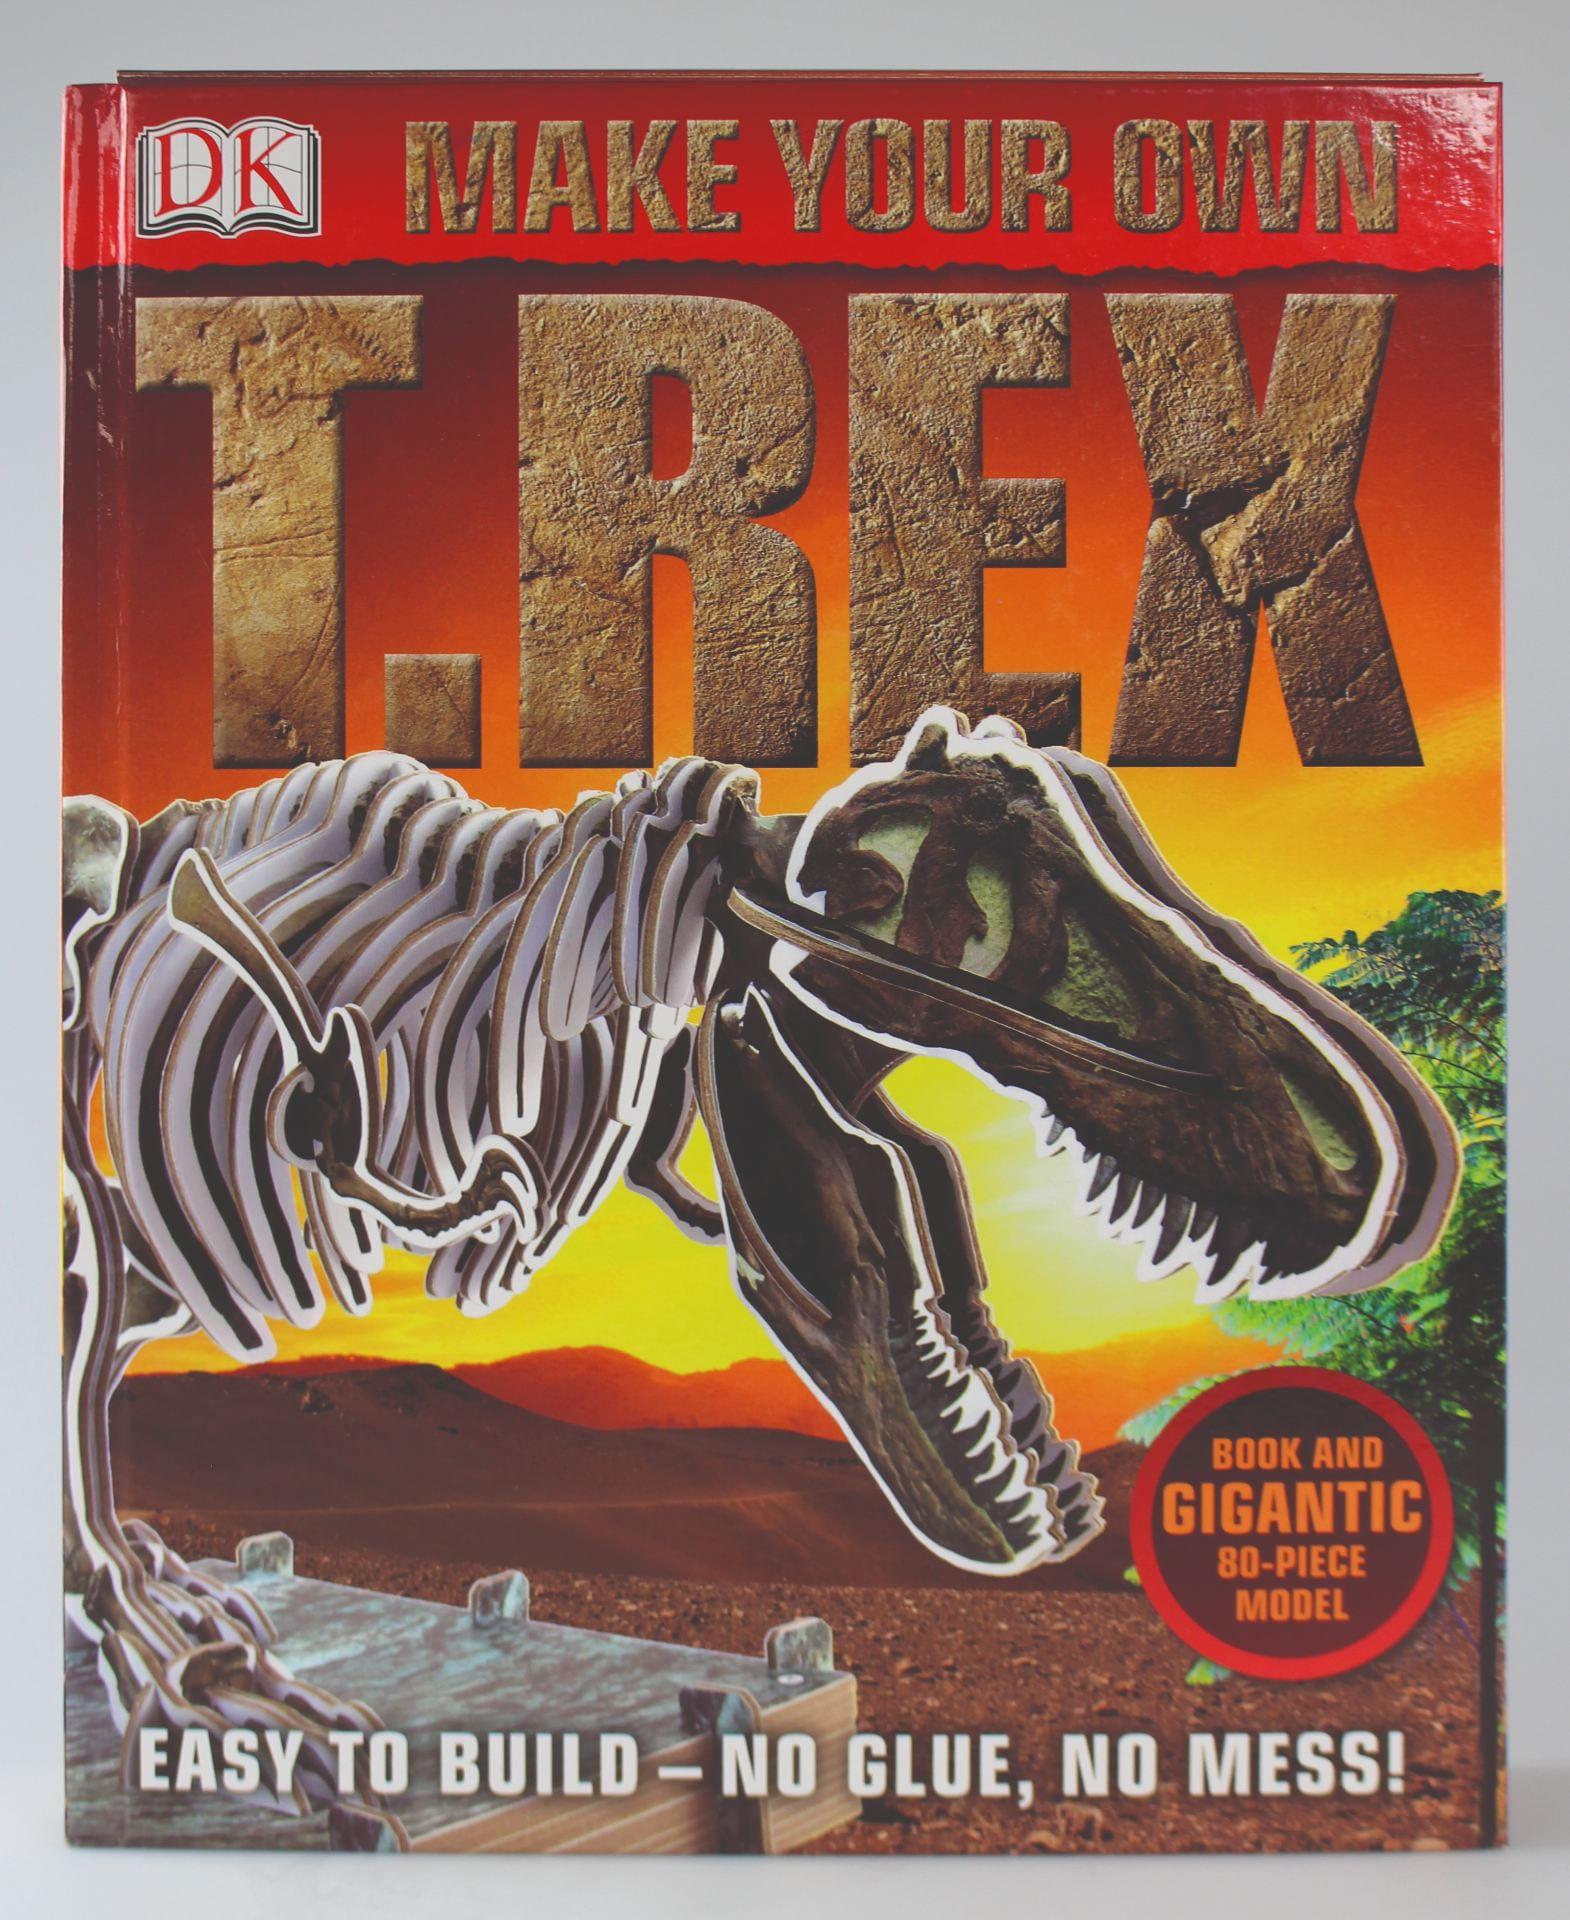 'Dorling Kindersley', 'Make Your Own T.Rex' Project Art Editor & Paper Engineer Jemma Westing